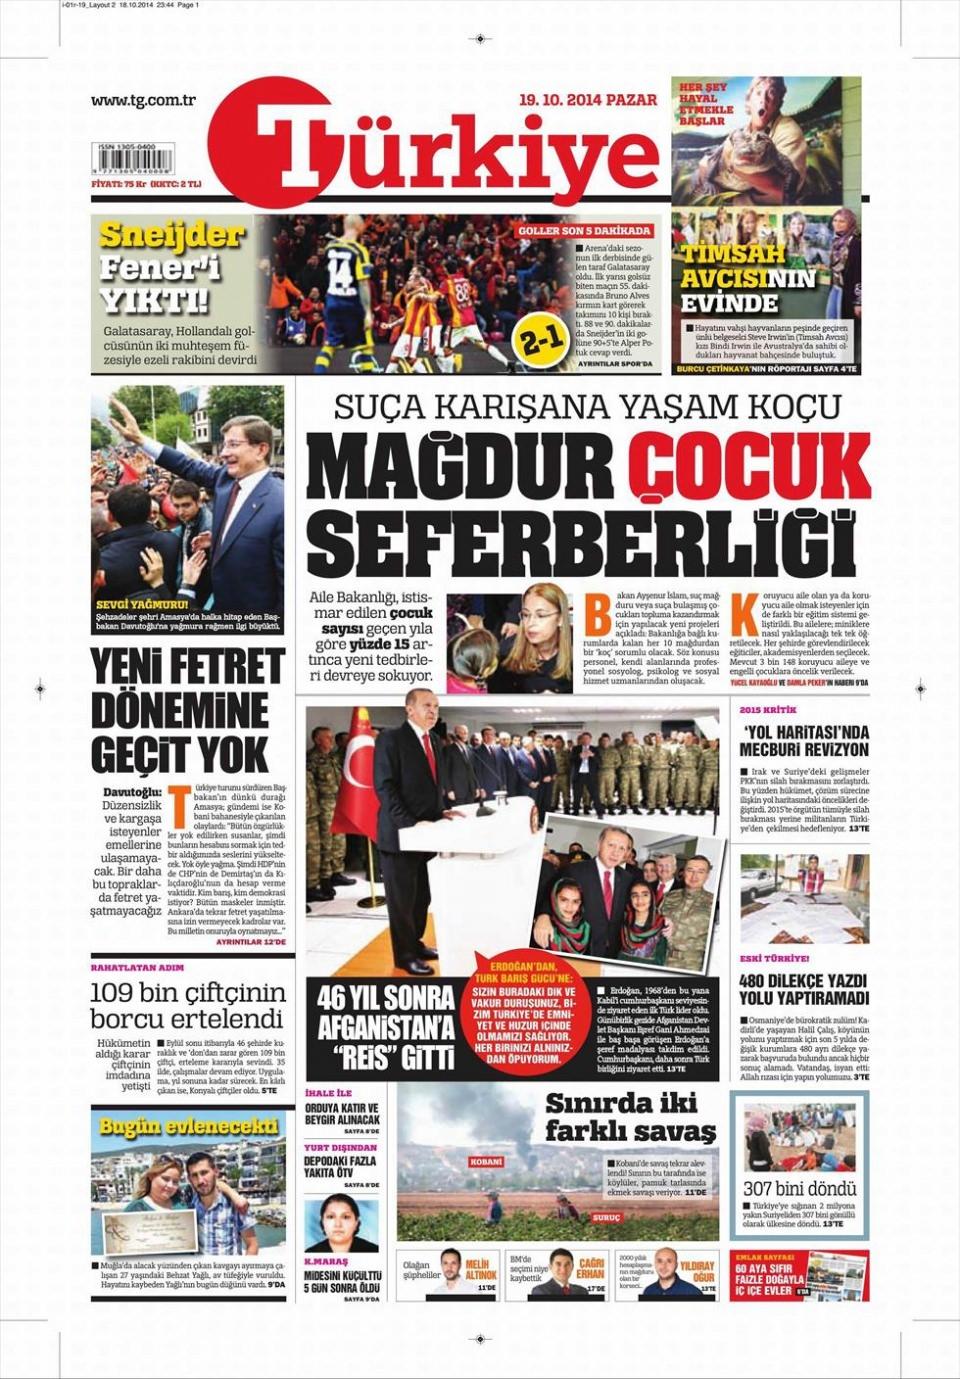 19 Ekim 2014 gazete manşetleri 9